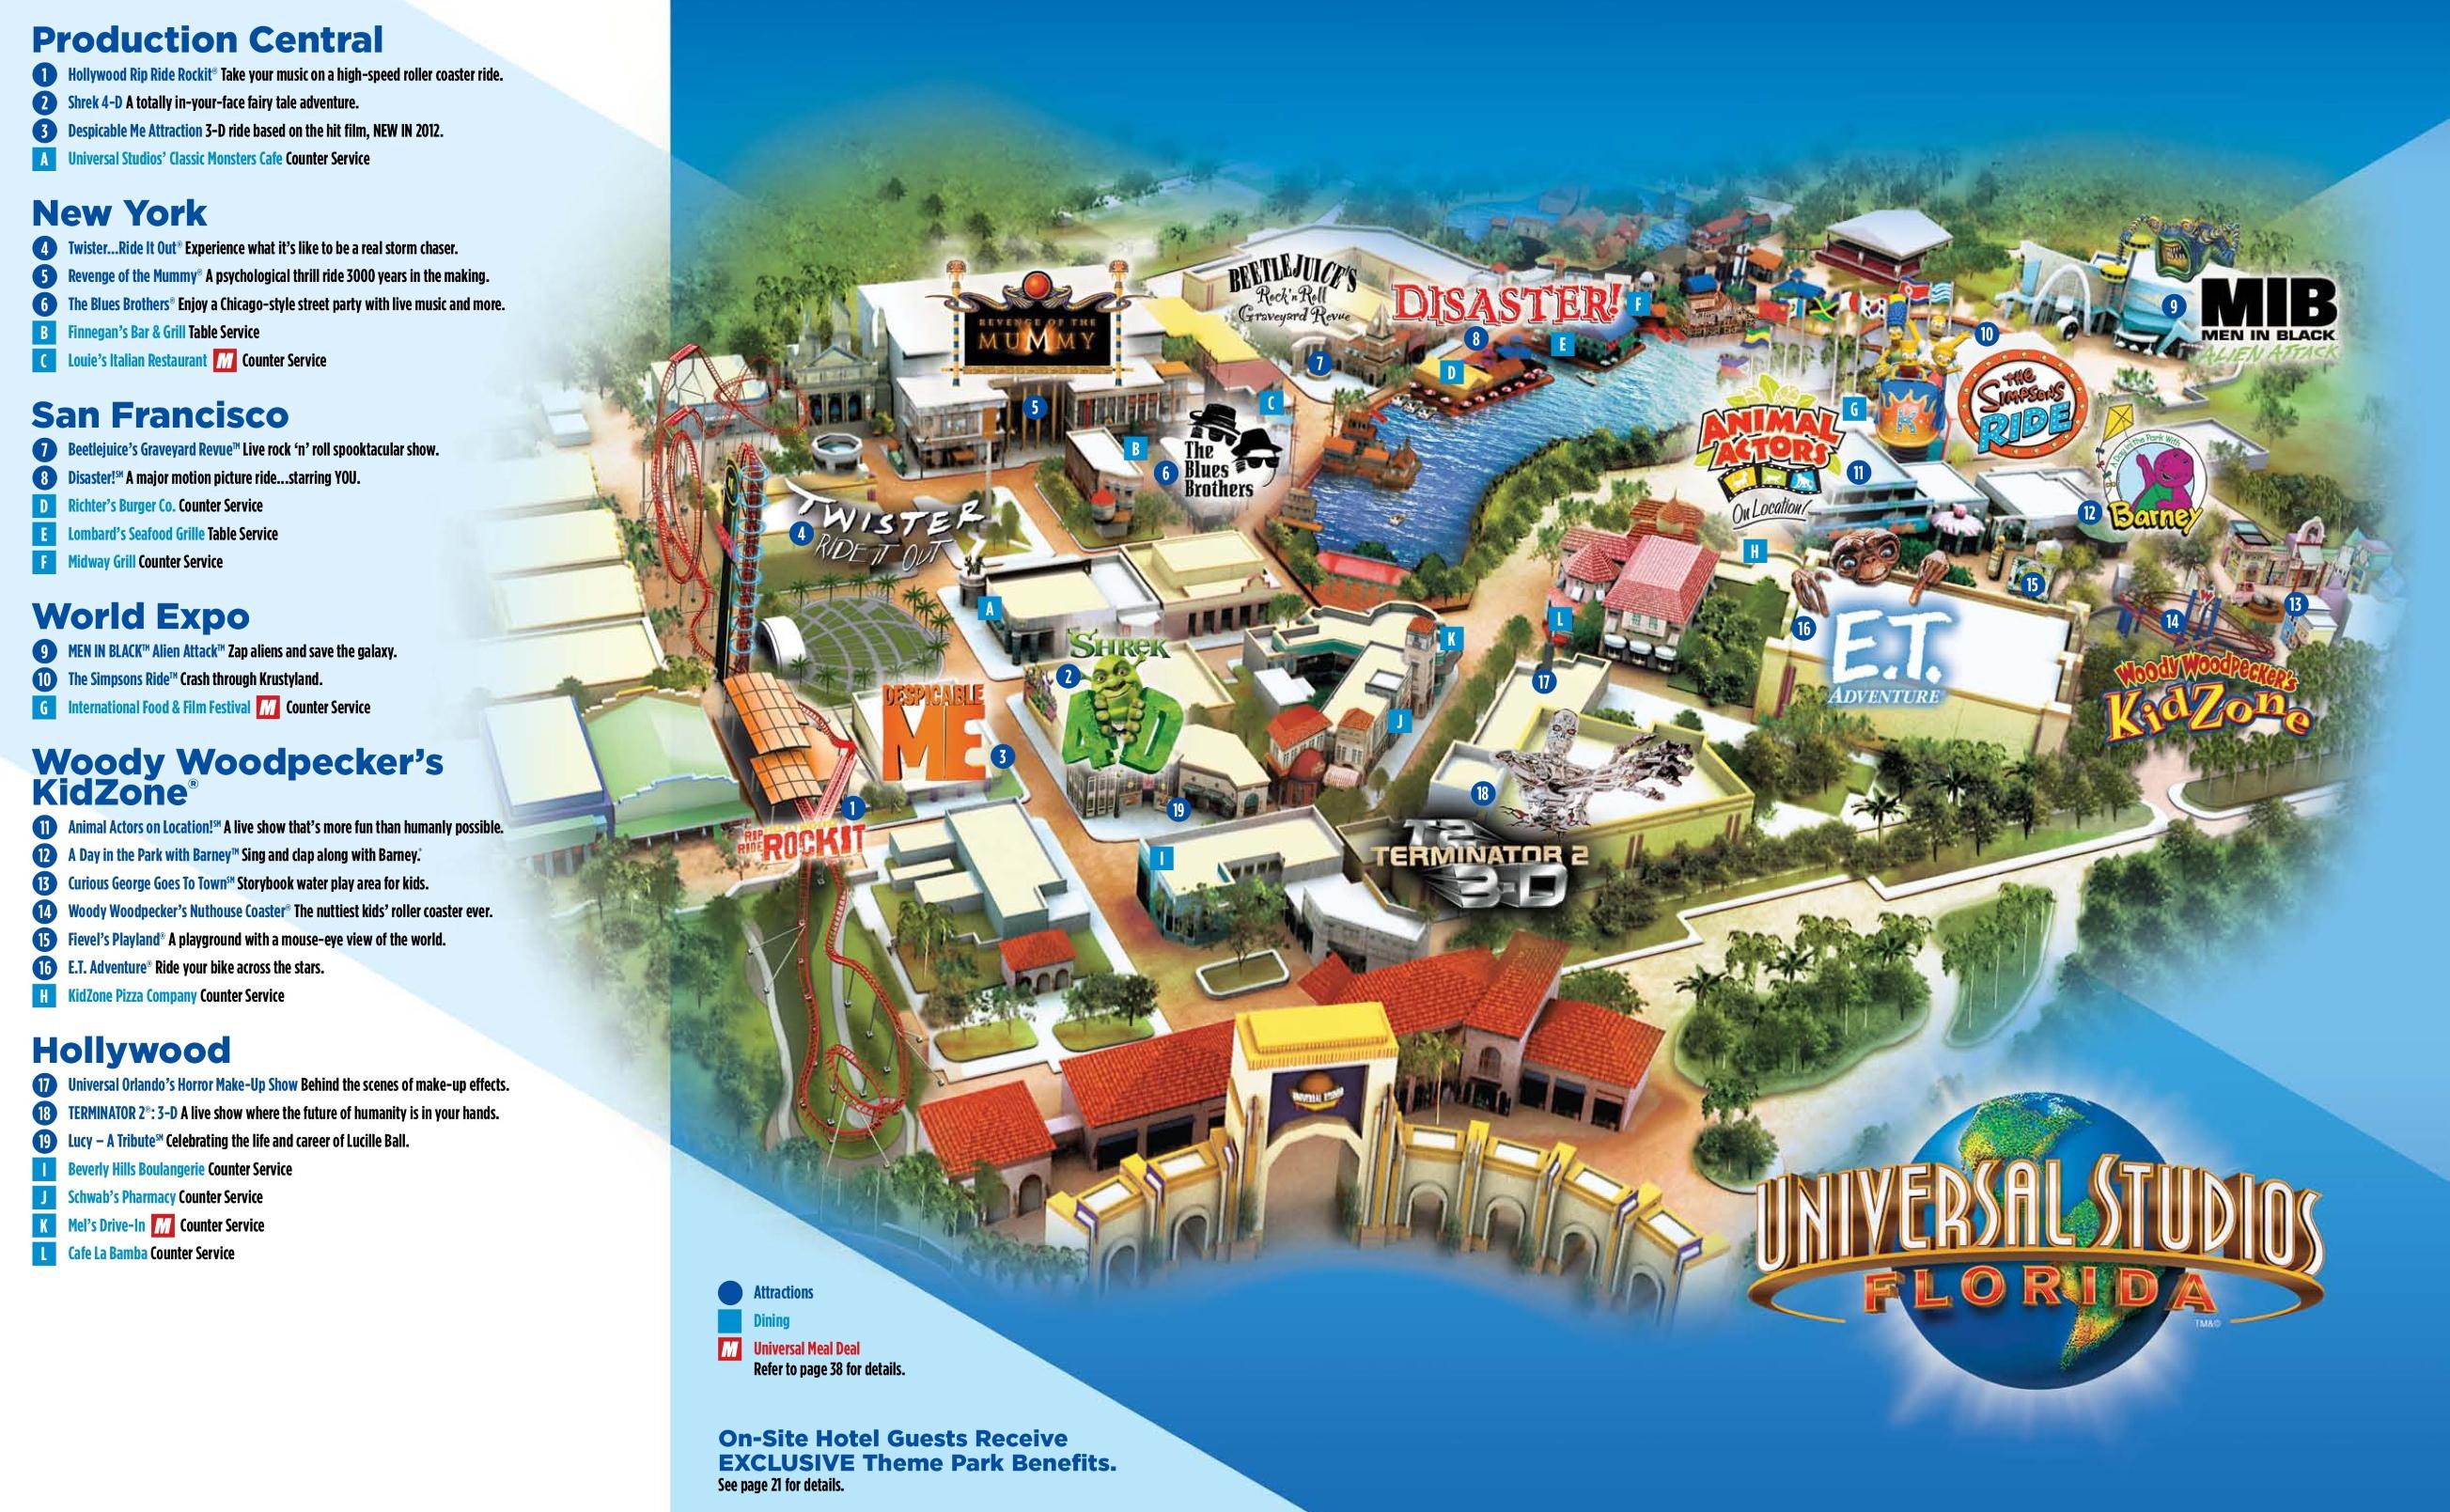 Orlando Universal Studios Florida Map Map Hd Universal Studios Map - Orlando Florida Universal Studios Map